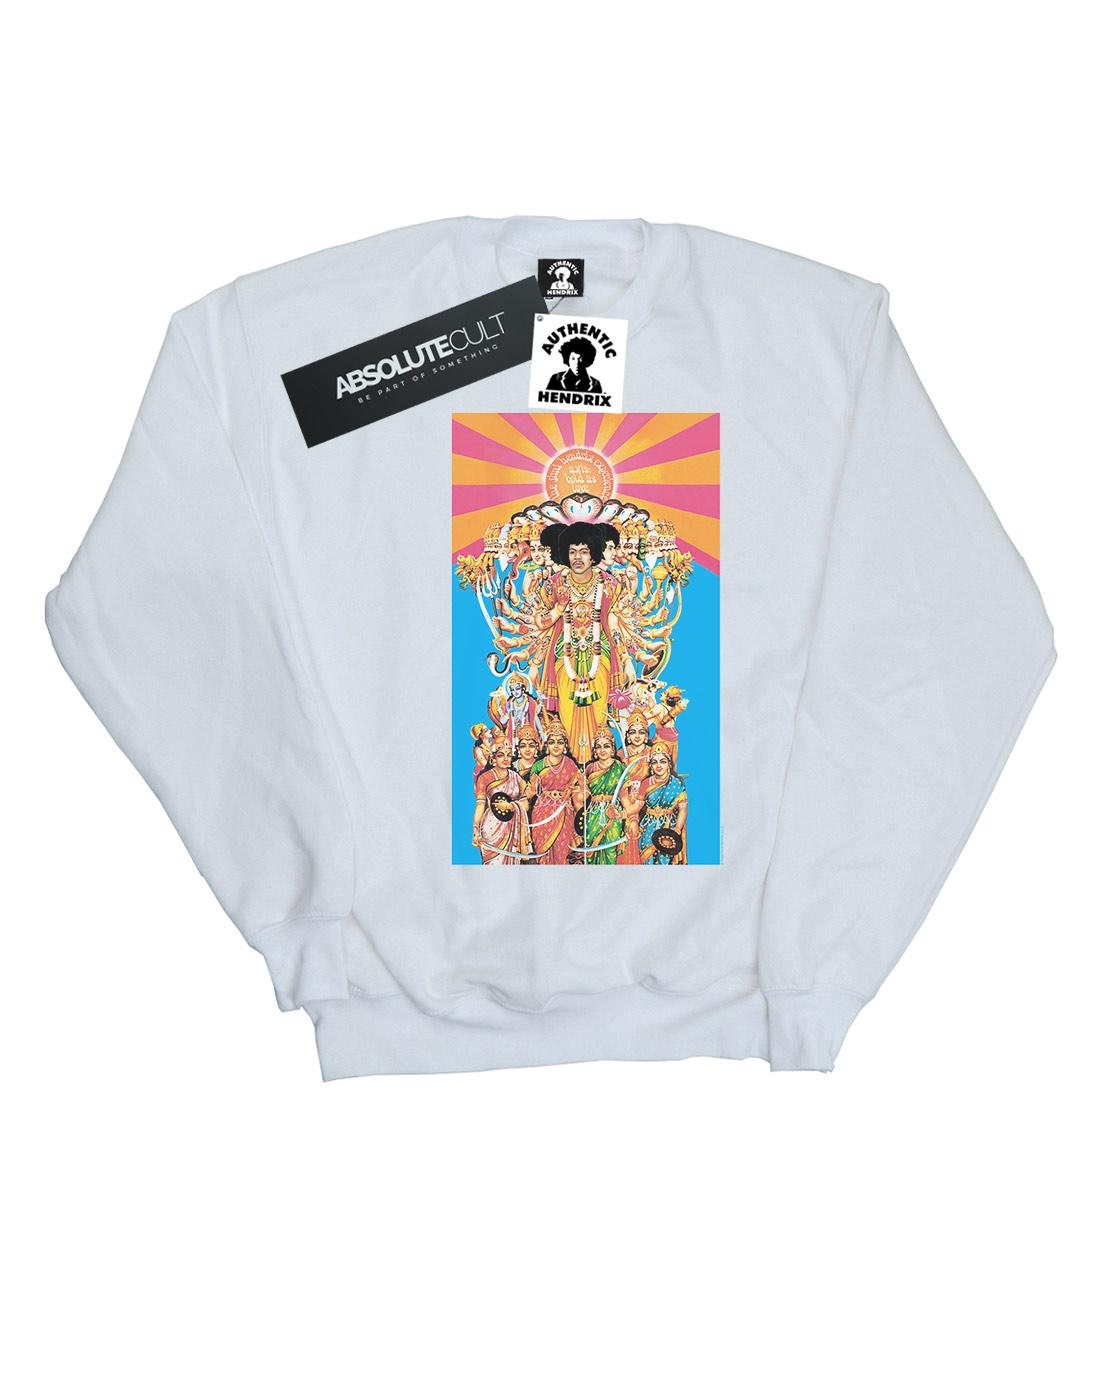 ABSOLUTECULT Jimi Hendrix Girls Smash Hits Sweatshirt